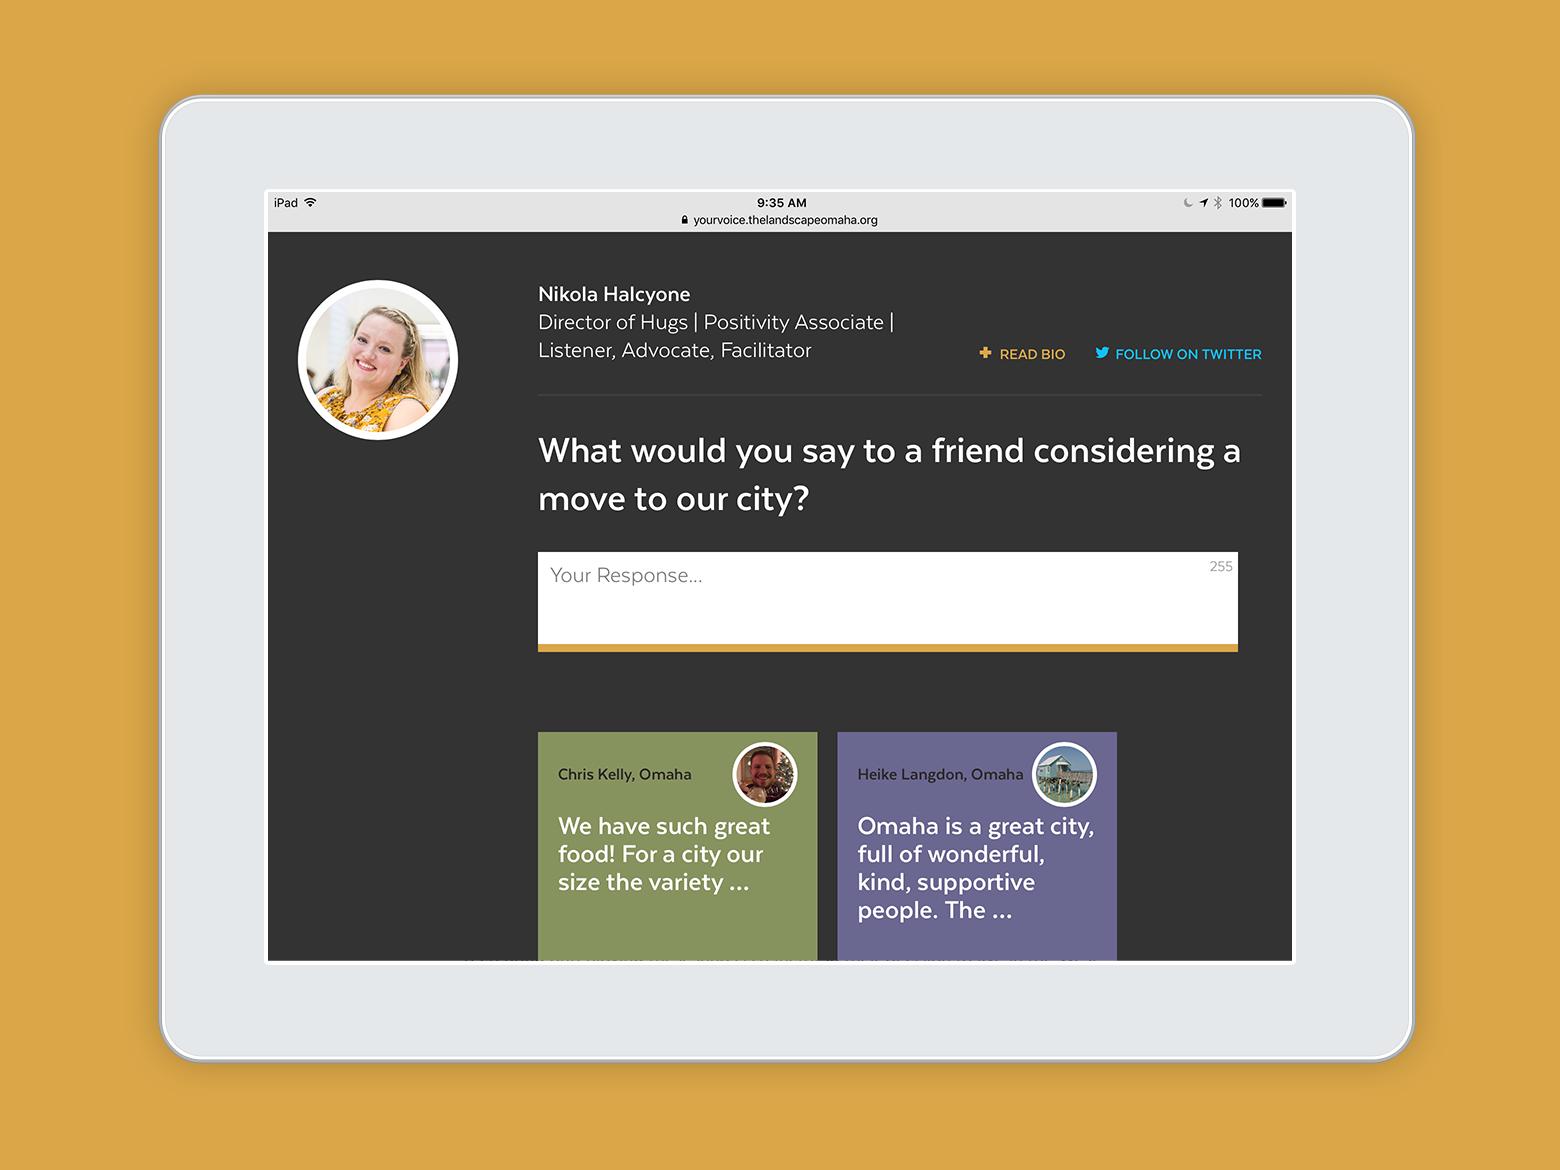 jkdc_voices-tablet-question.png